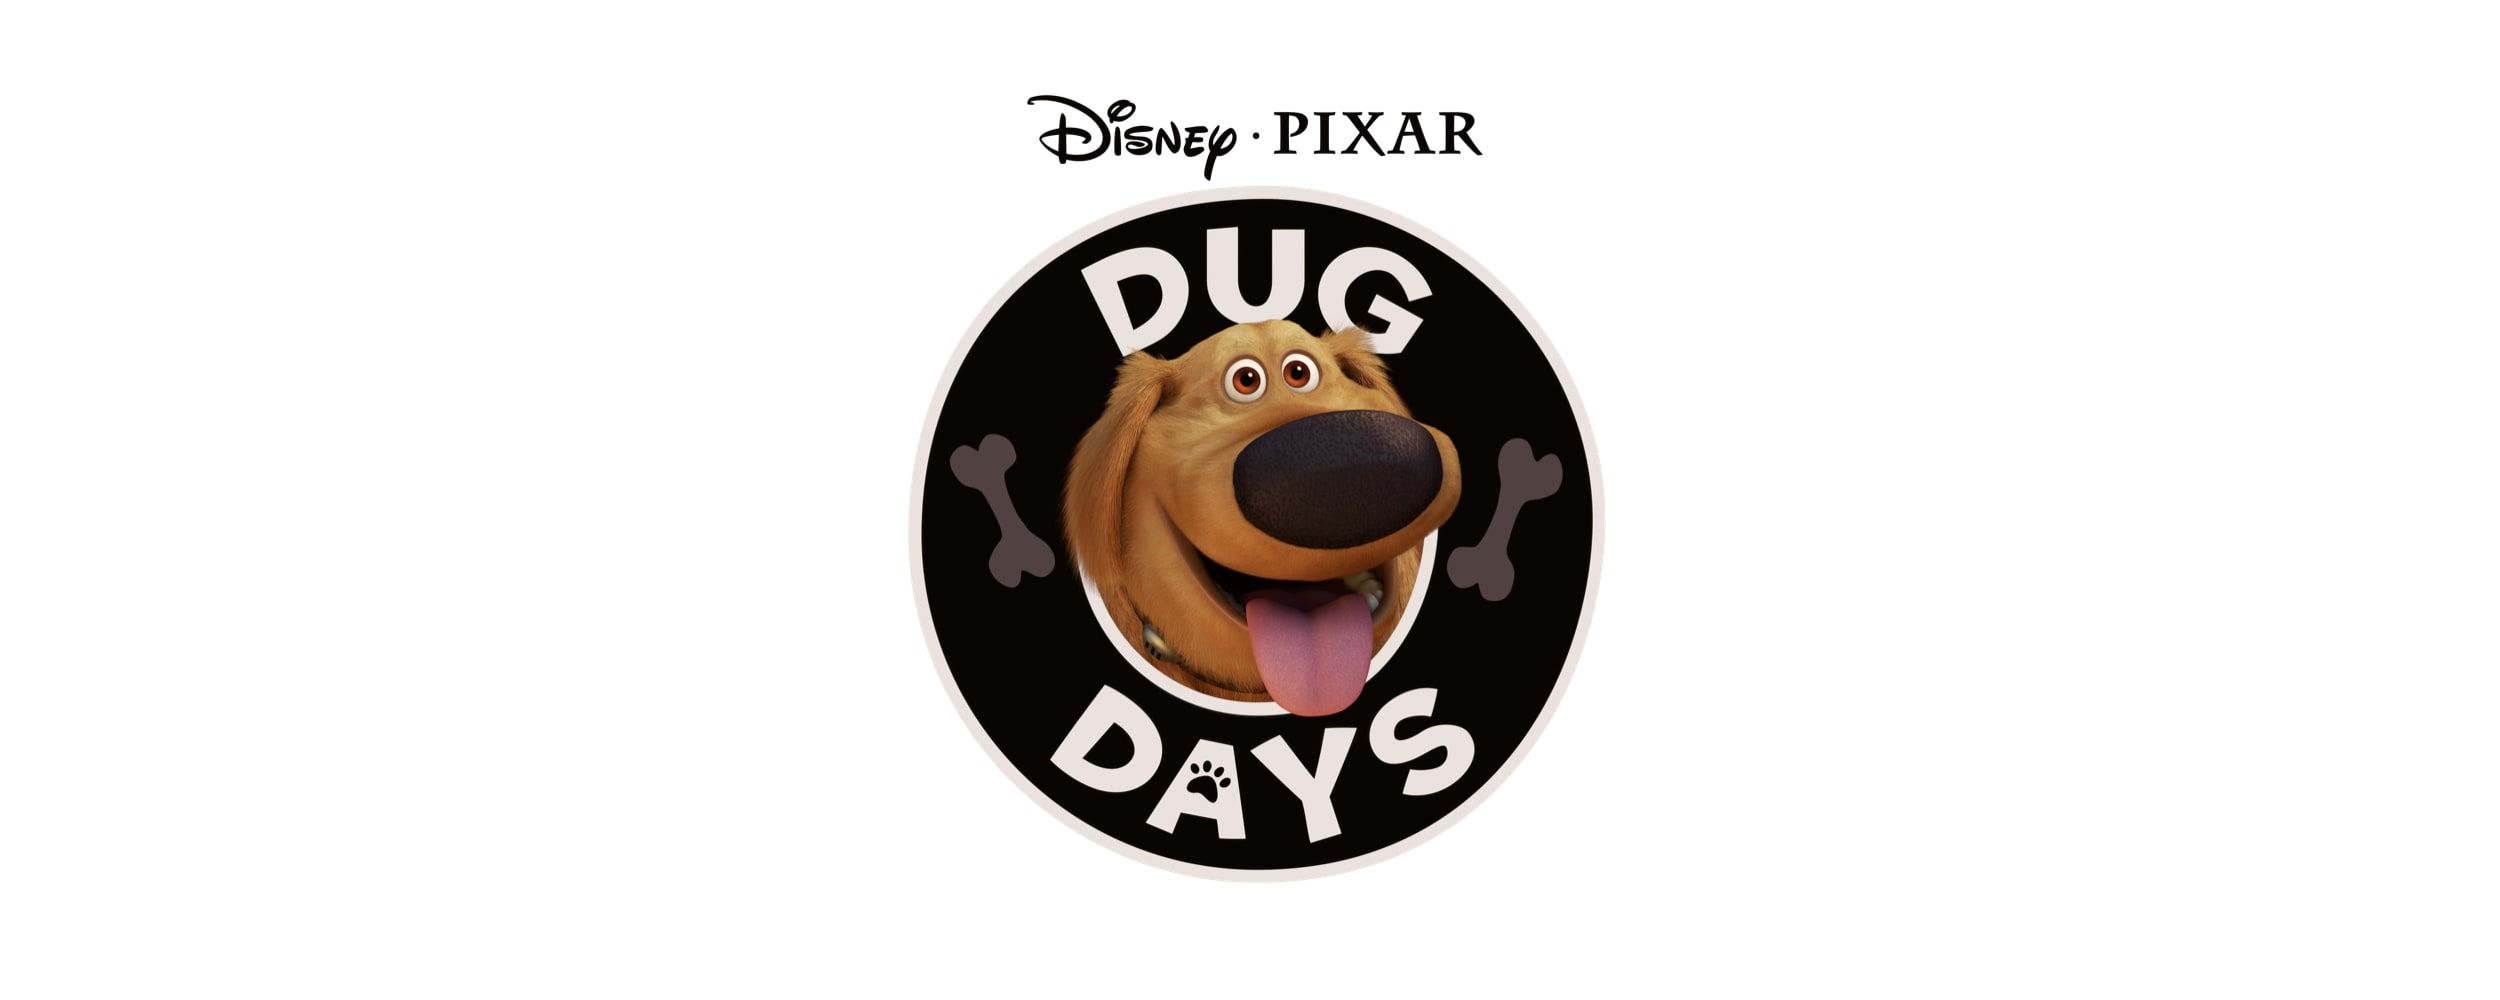 "Disney+ Releases New Trailer And Key Art For Pixar Animation Studios' ""Dug Days"" Premiering September 1"